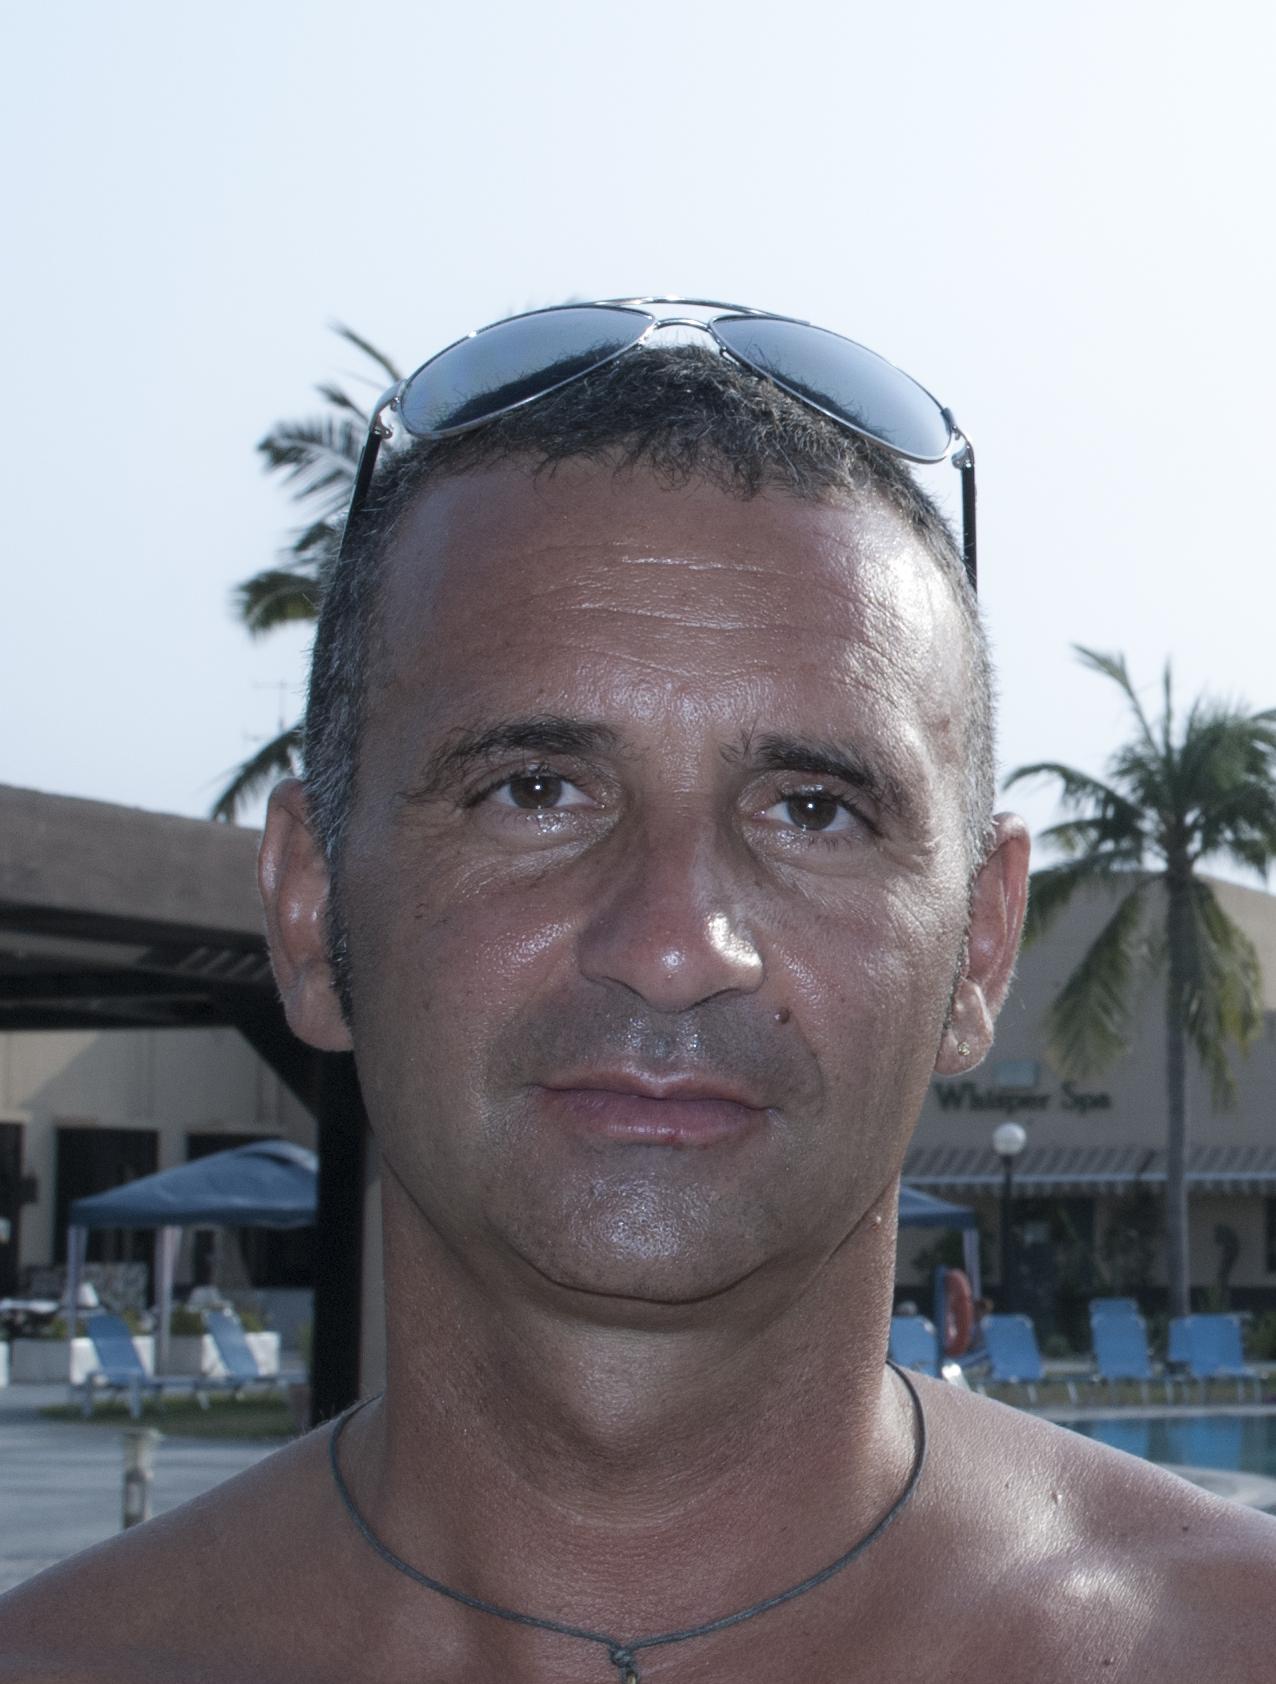 Massimiliano Bertacca